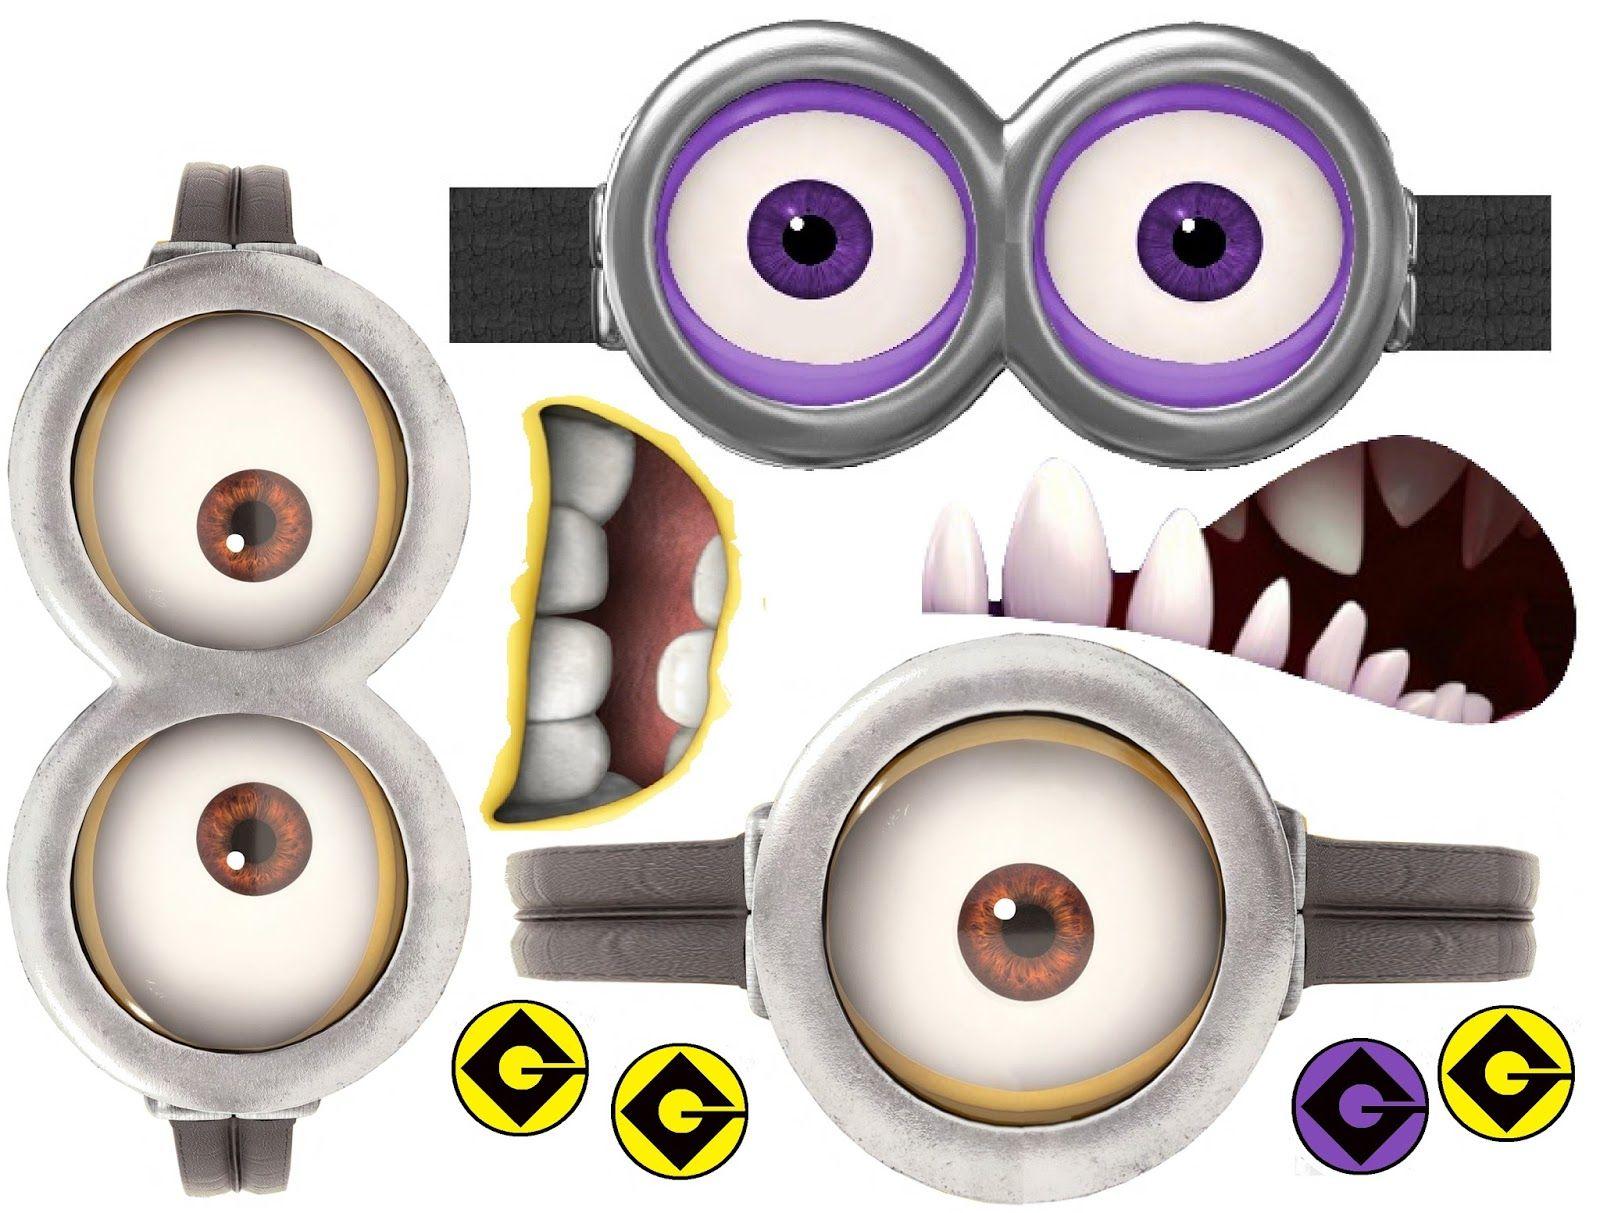 1600x1213 Minions Clipart Goggles Cute Borders, Vectors, Animated, Black And